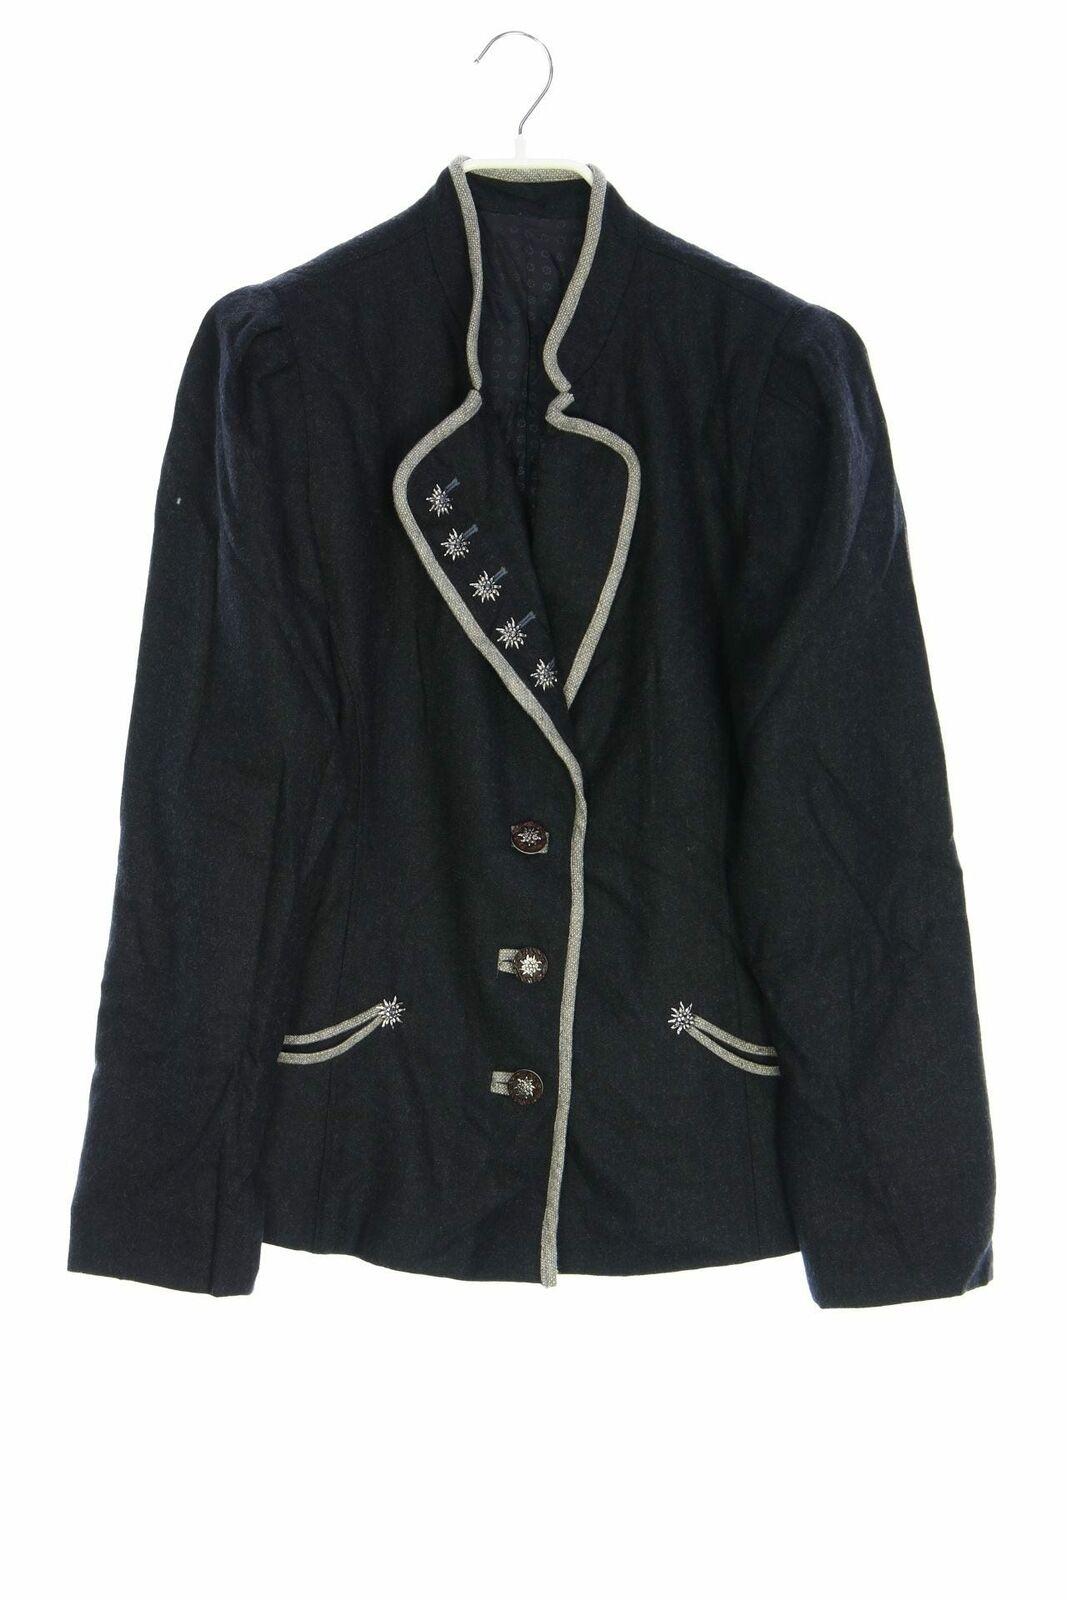 Trachten-Jacke mit Applikationen D 40-42 anthrazit Oktoberfest Trachtenjacke